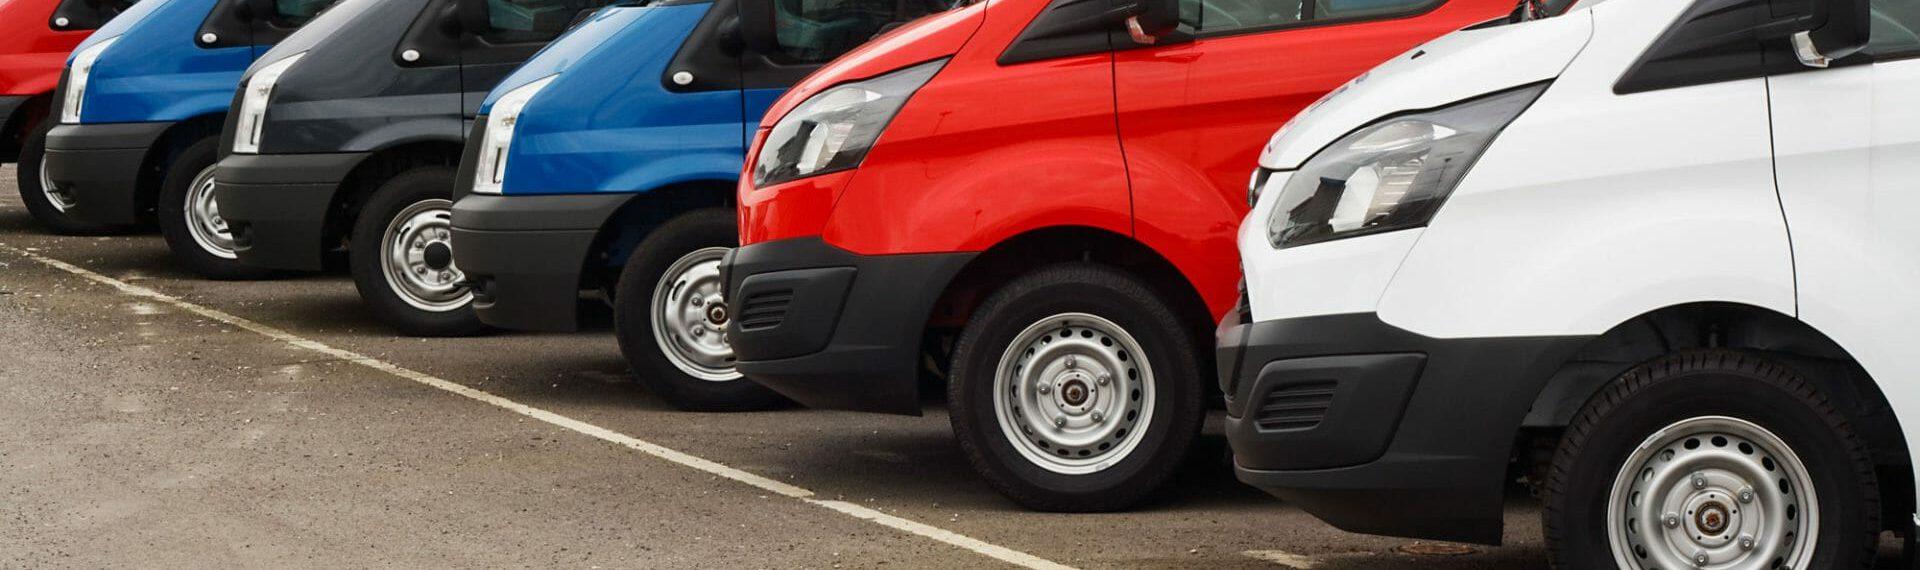 How to keep your van safe as a tradesman